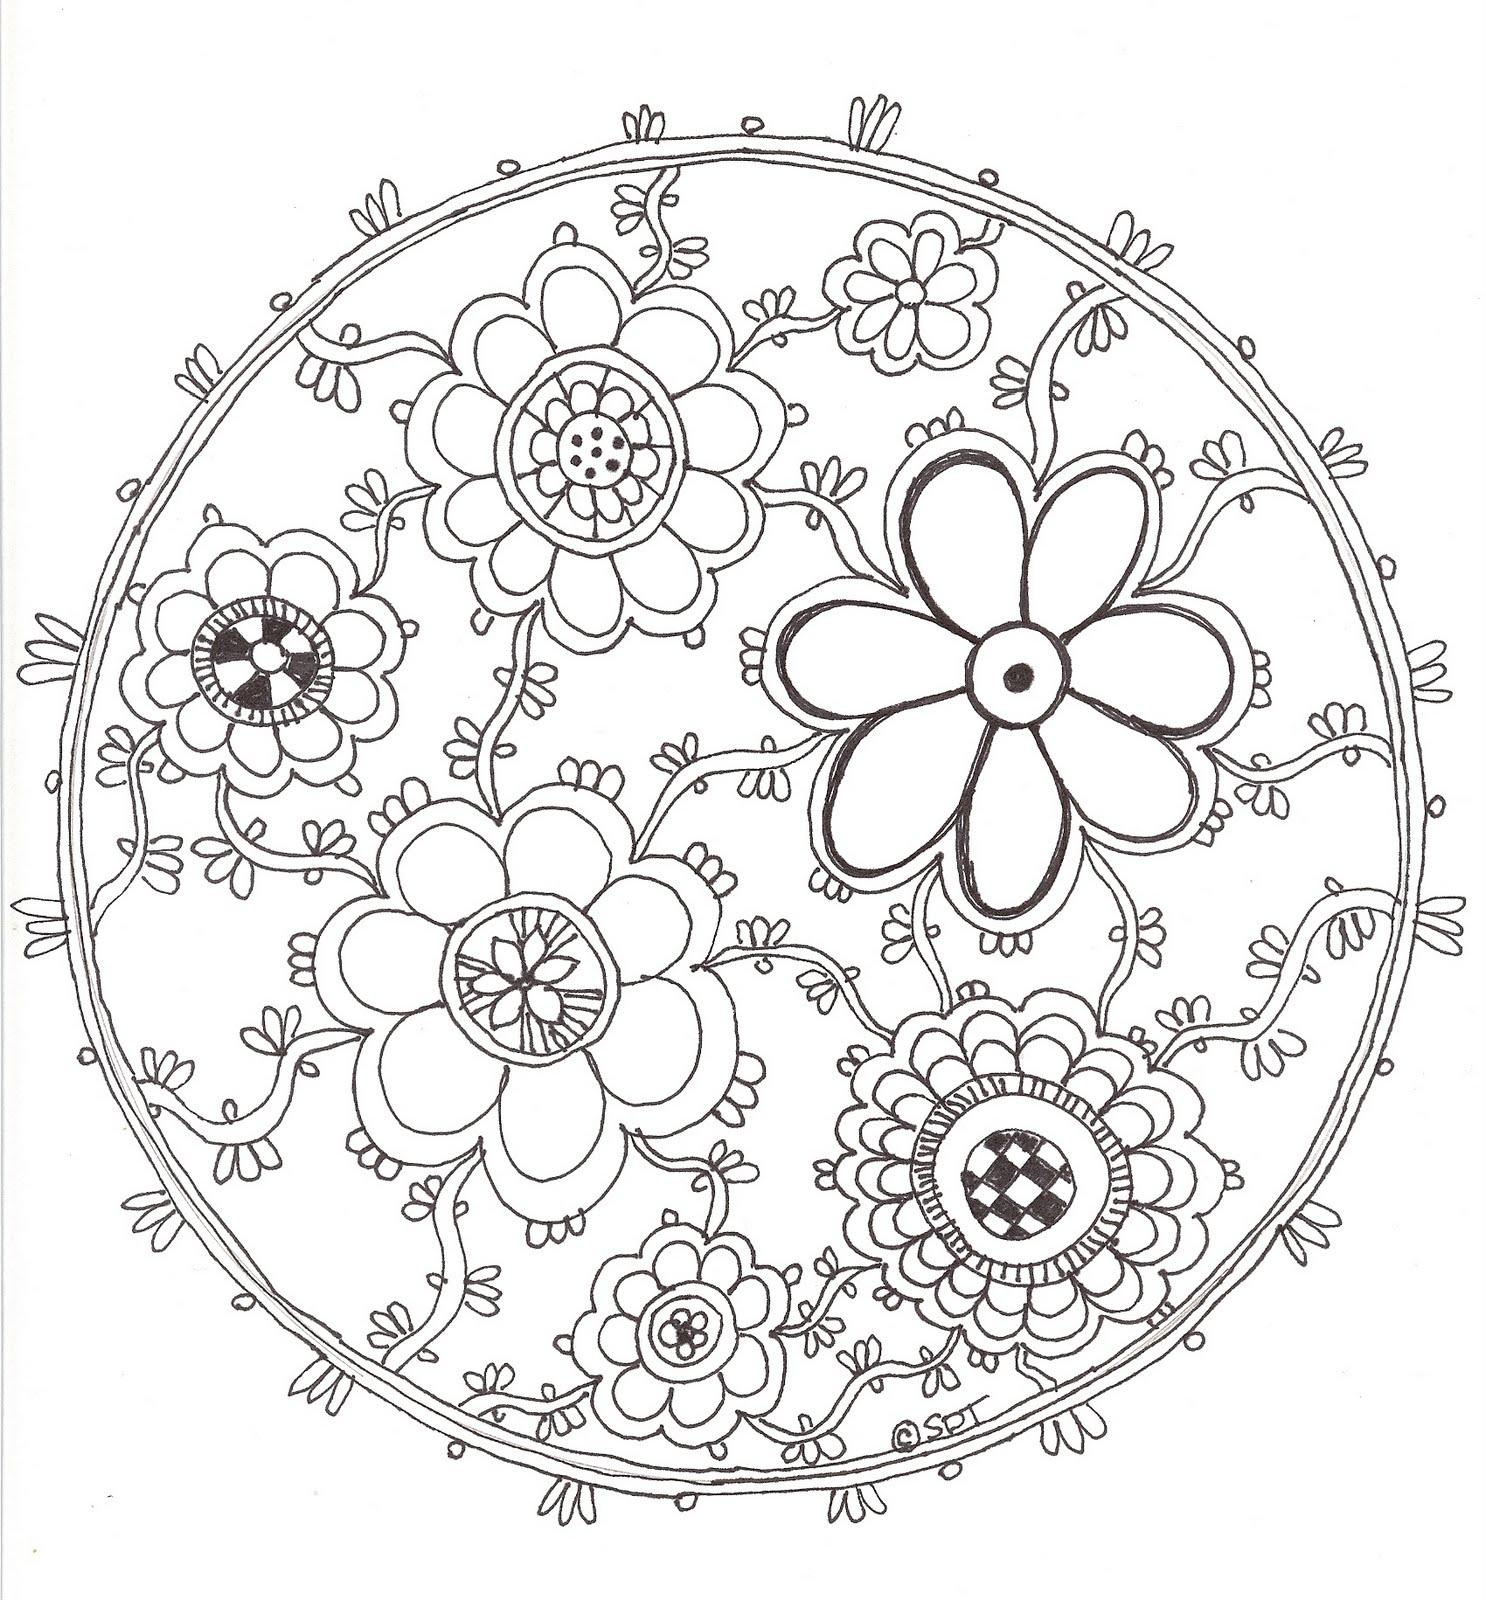 lotus flower mandala coloring pages - Ecosia